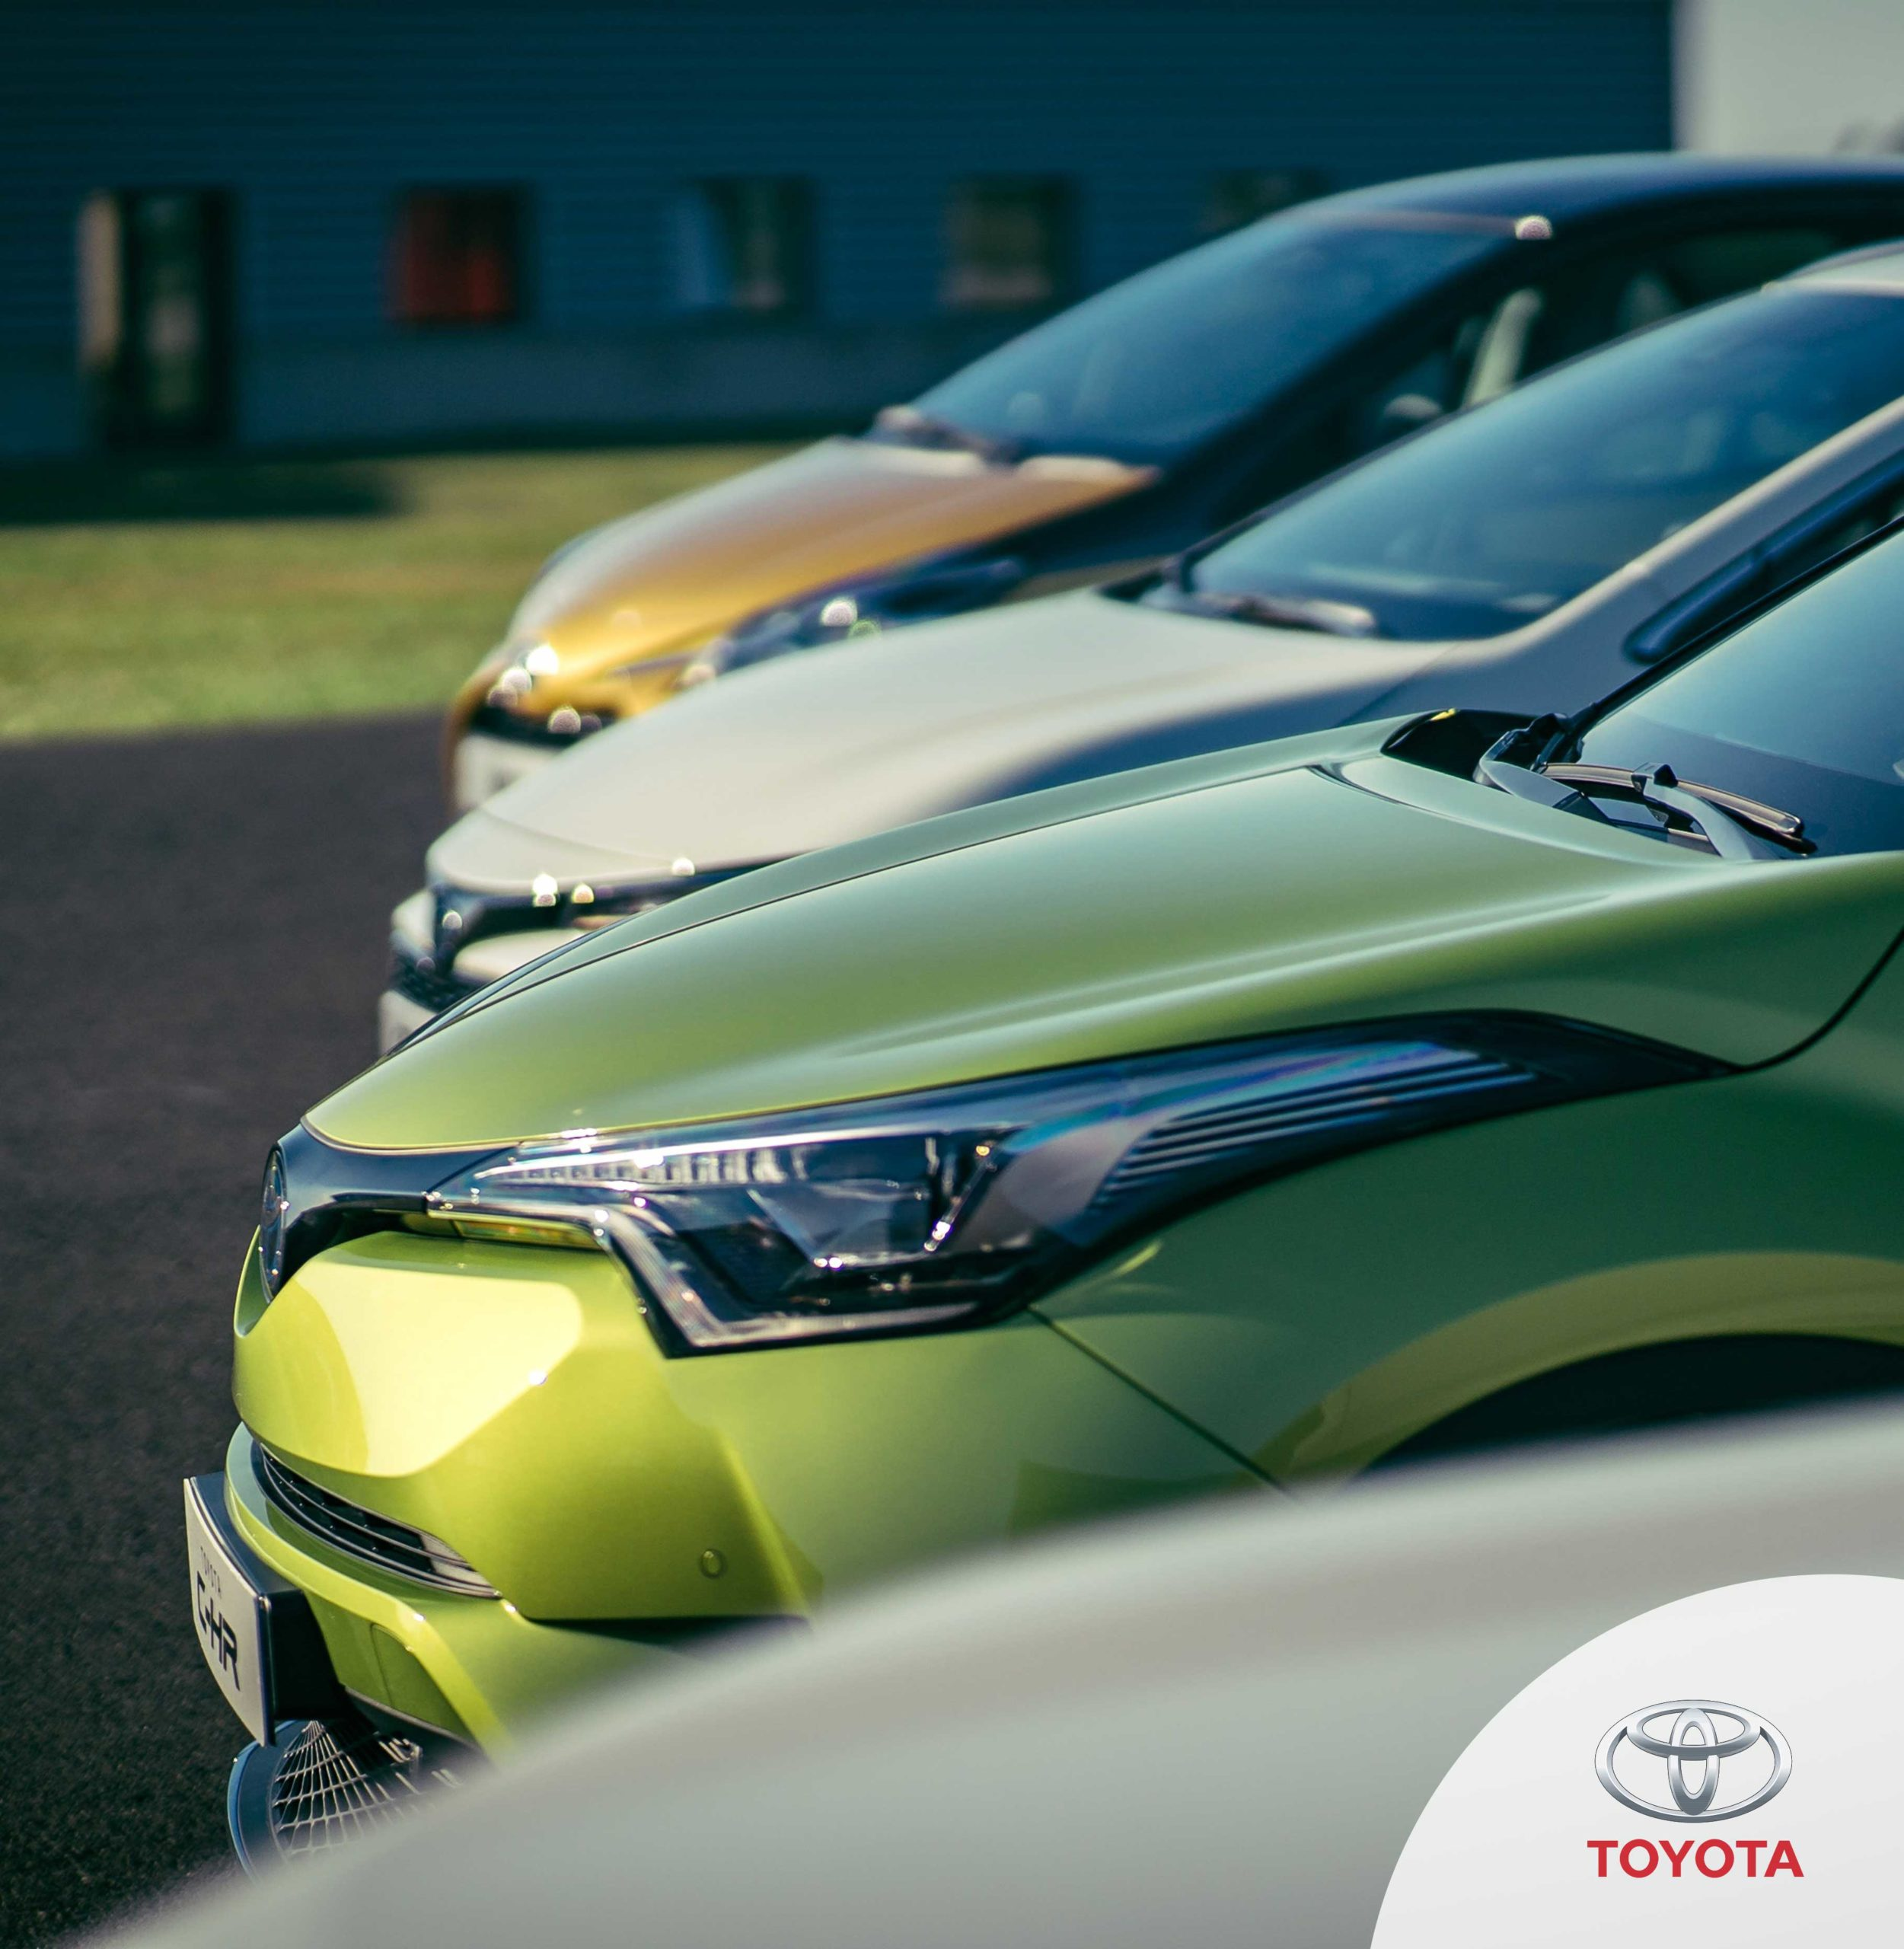 «Toyota-Ukraine» develops business in Ukraine using Microsoft Dynamics AX ERP System